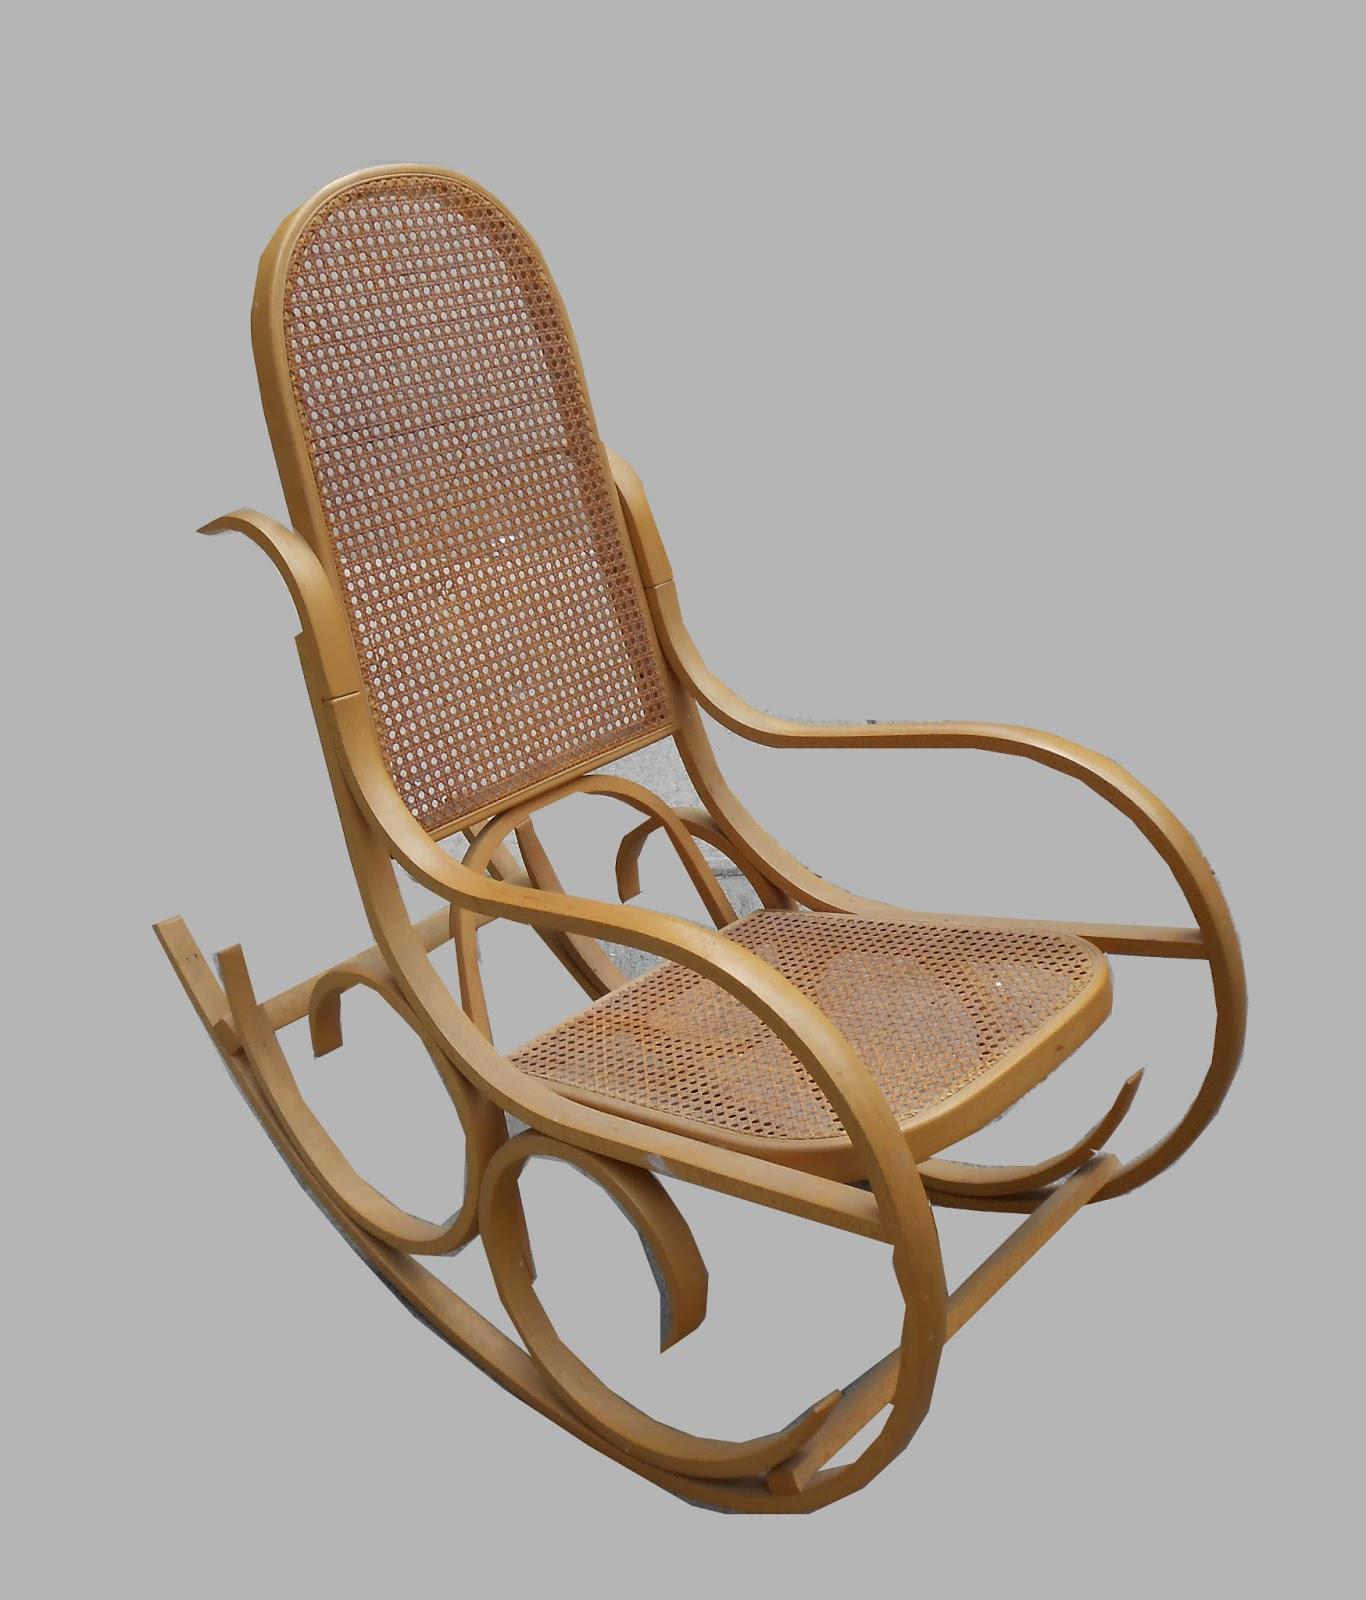 uhuru furniture collectibles thonet style bentwood rocker by luigi